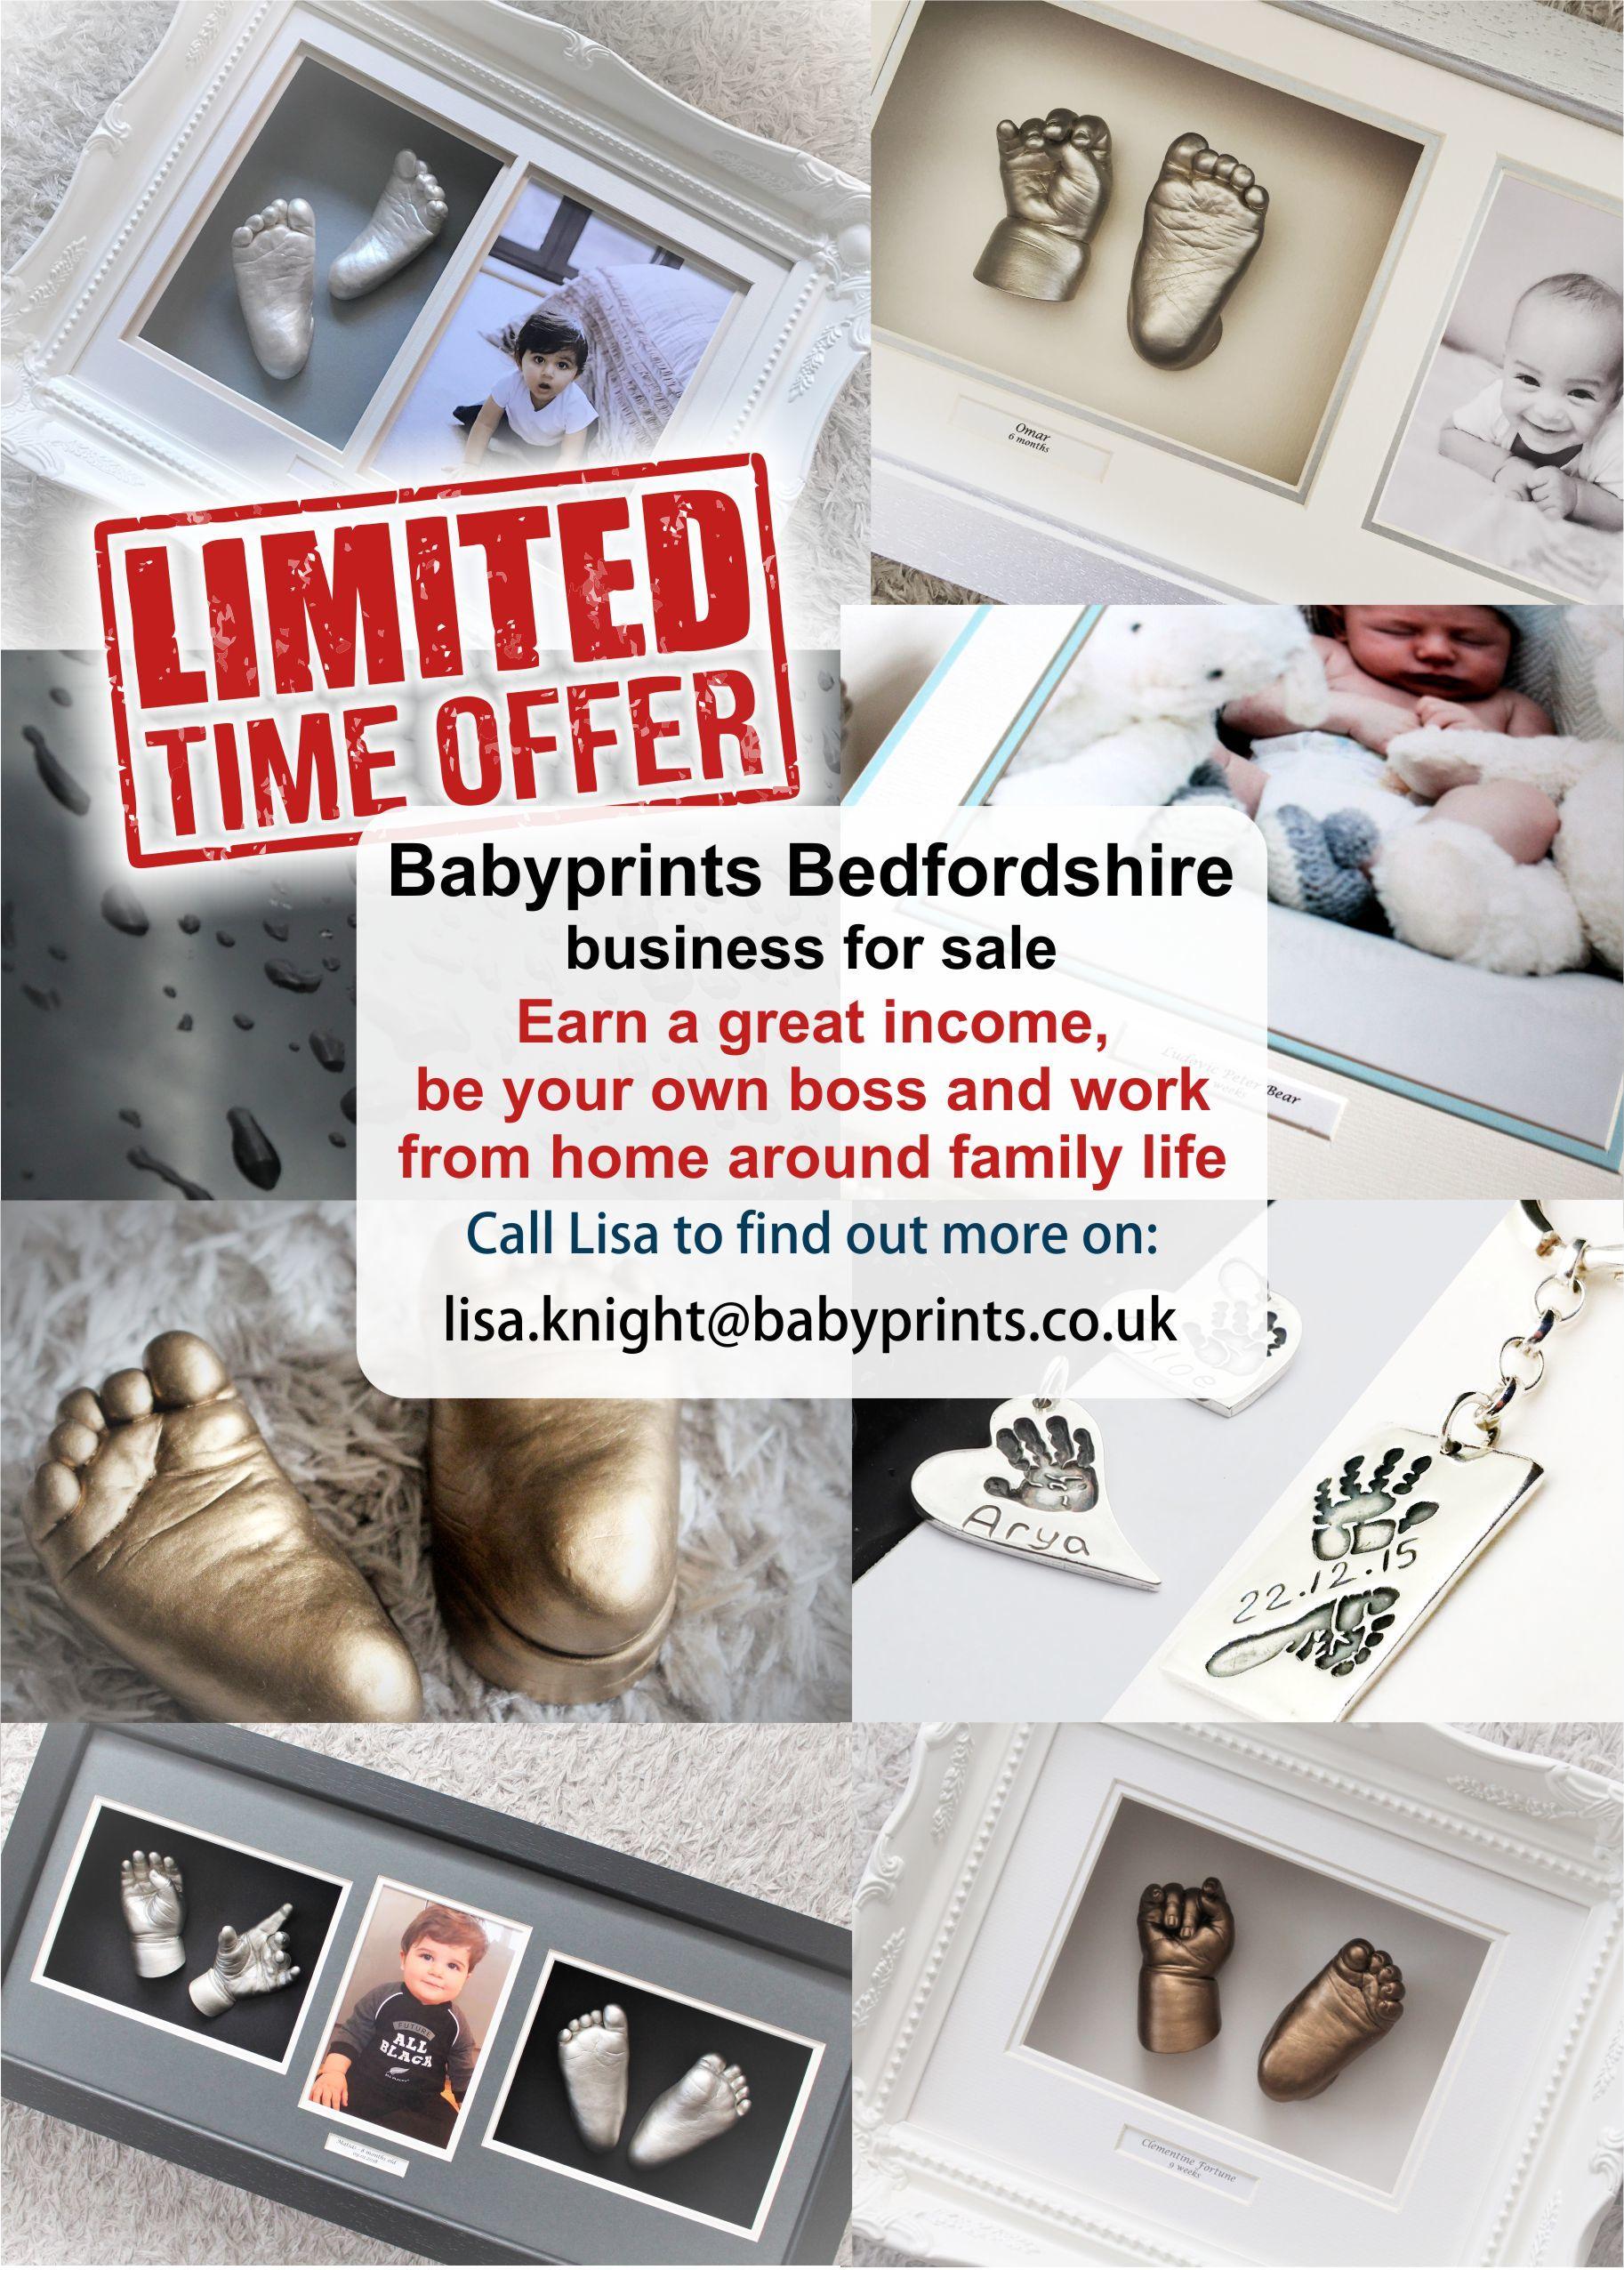 Bedfordshire Babyprints Business for sale